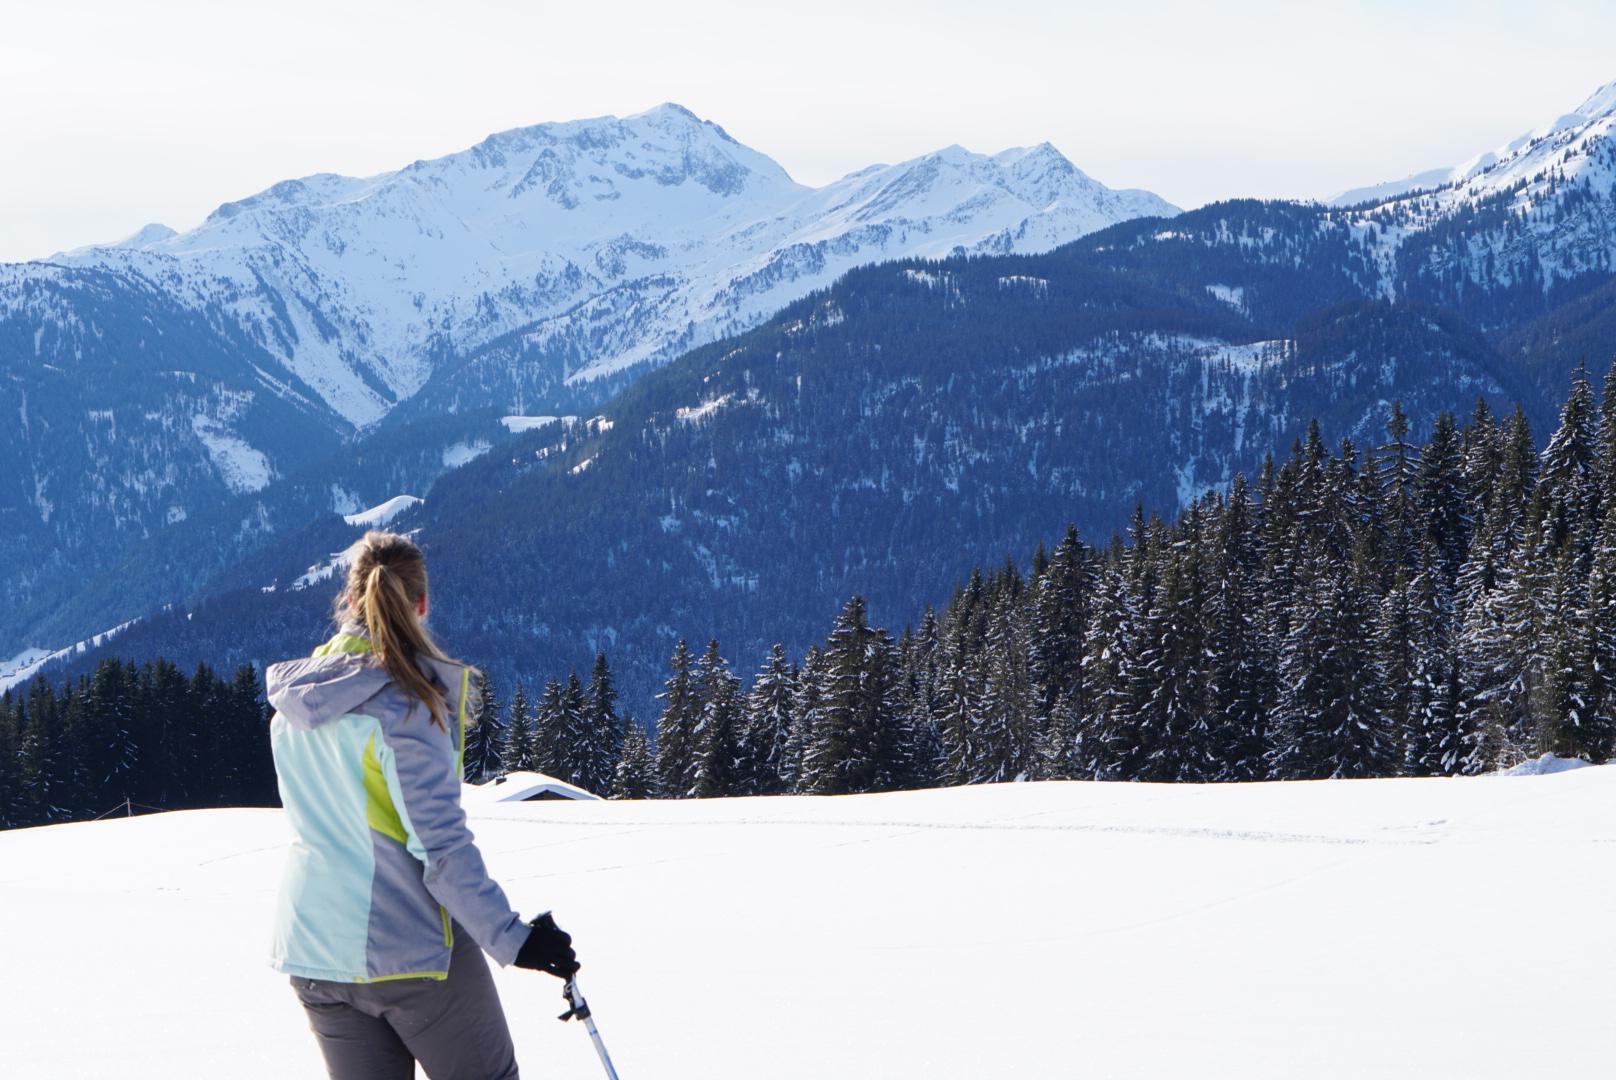 Slow Travelling, snowshoe hiking in France, region Savoie Mont Blanc, Massif des Bauges